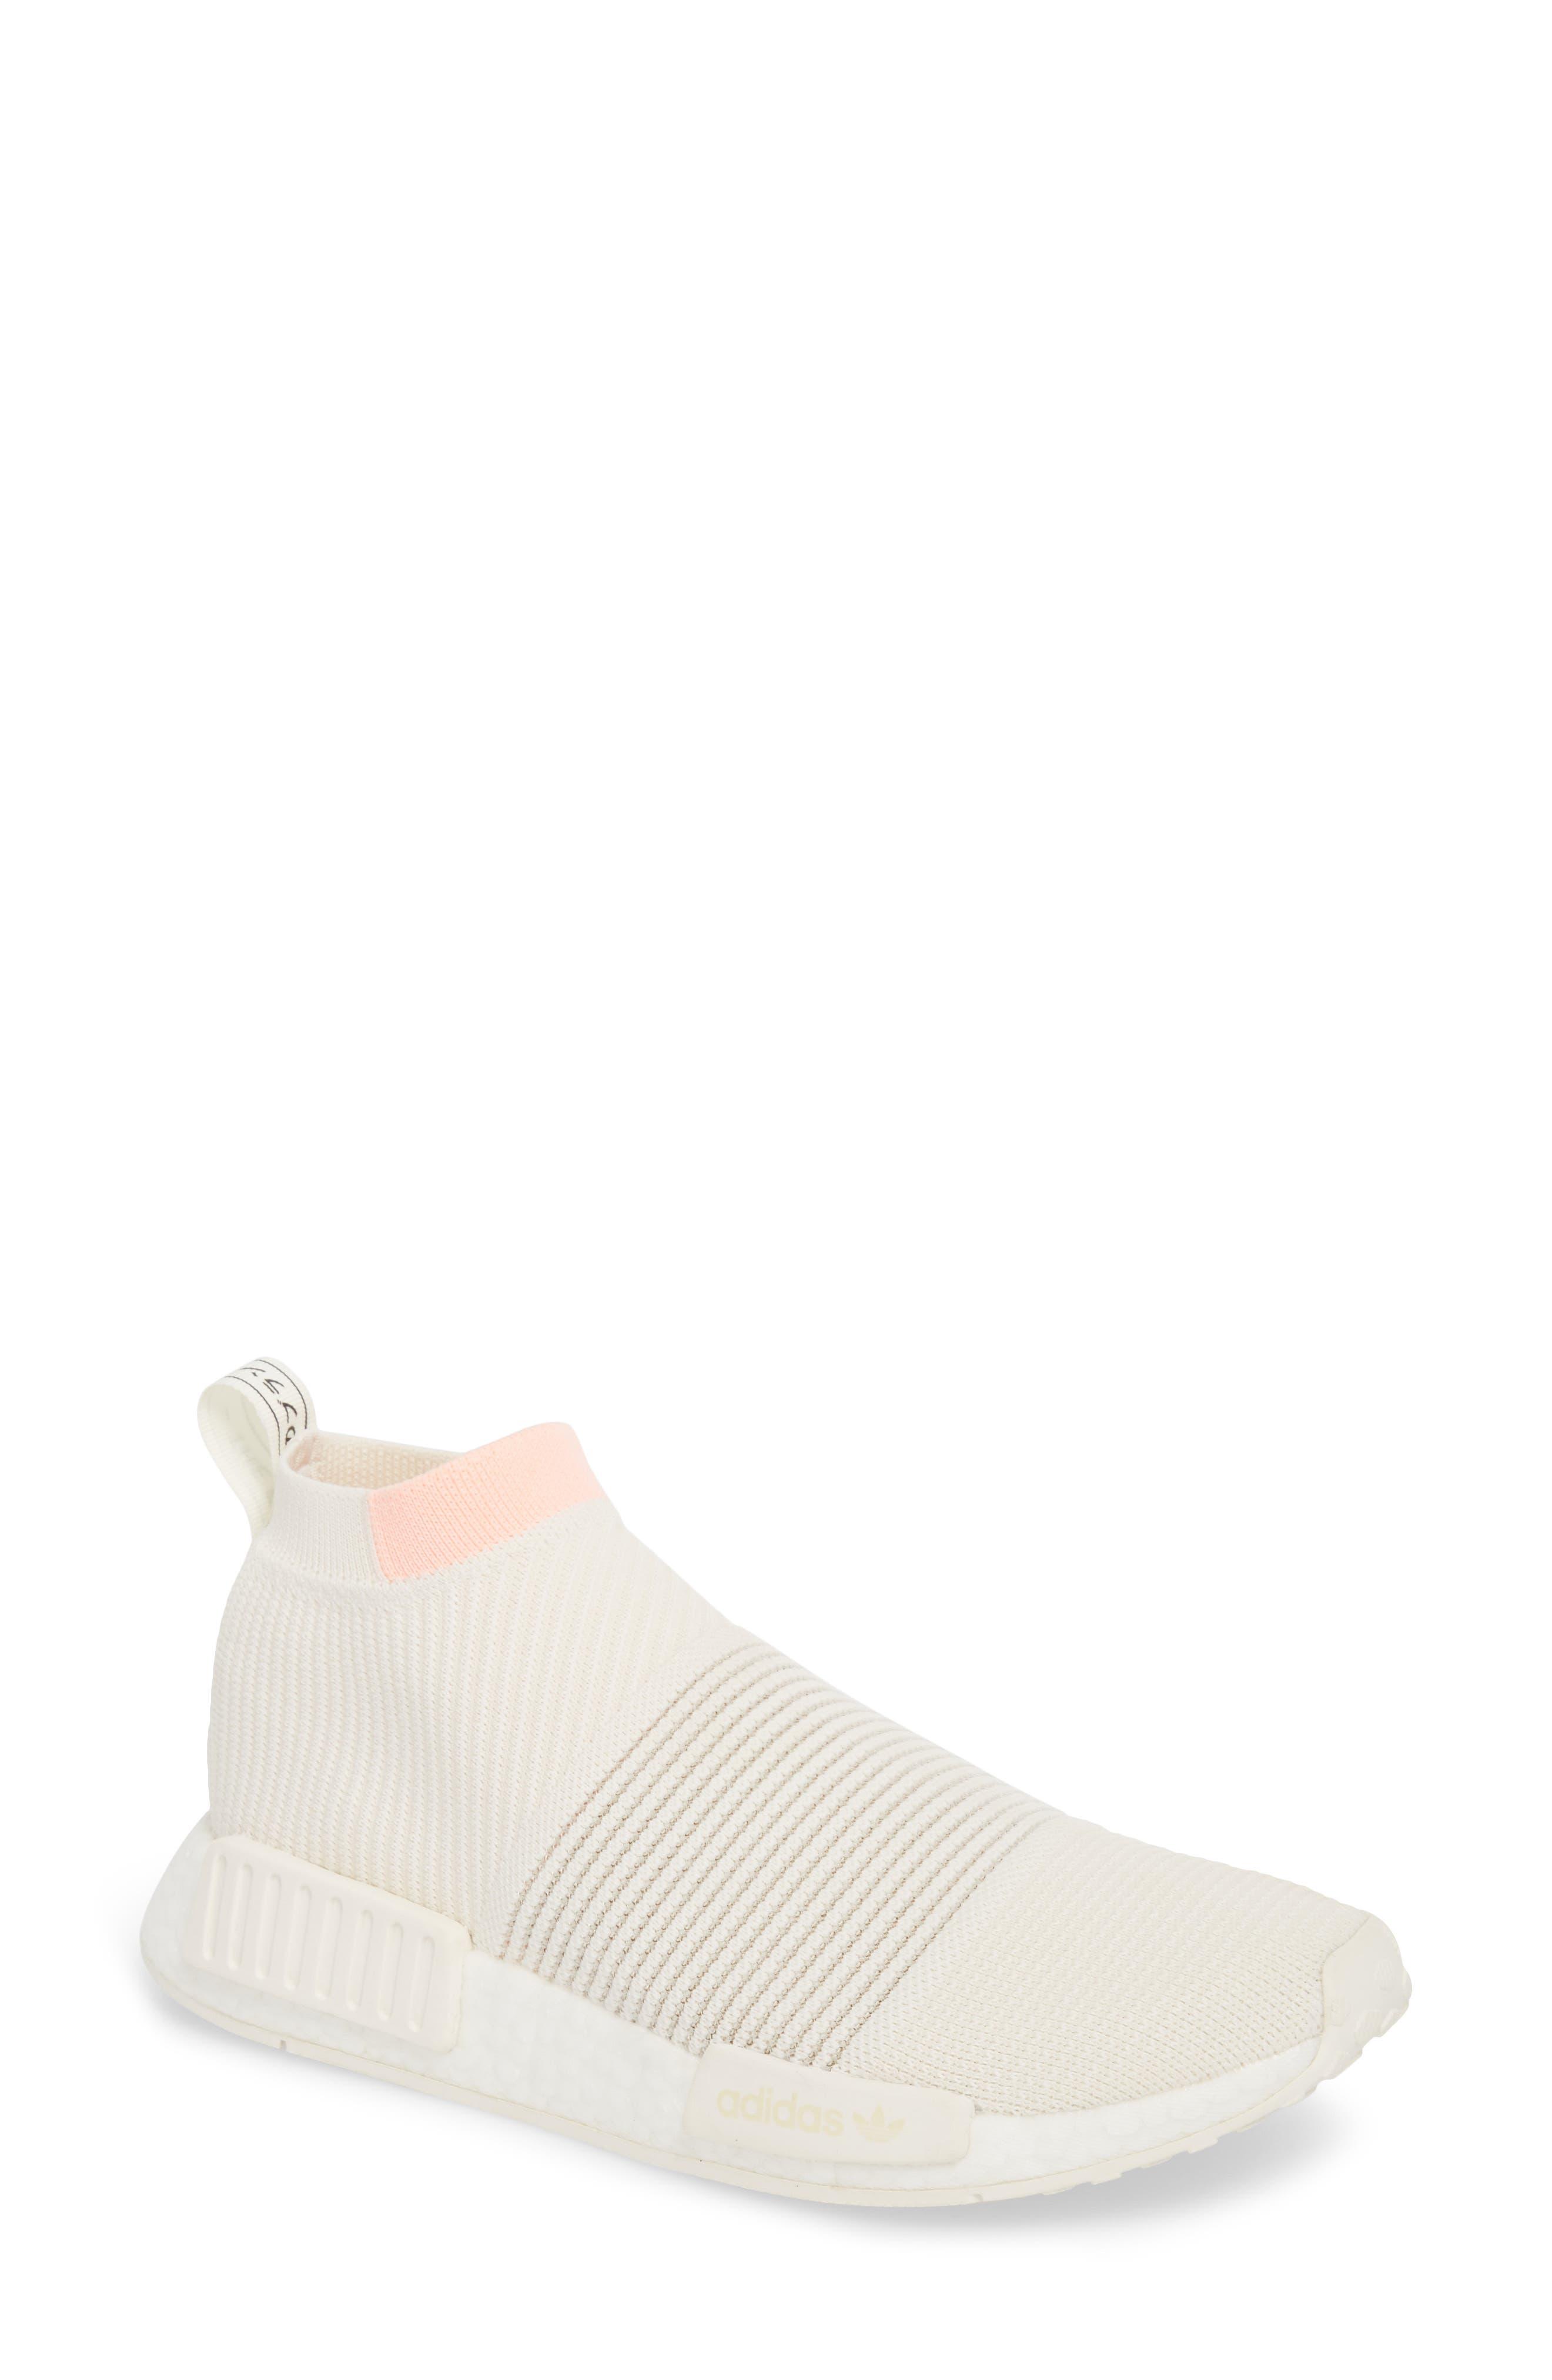 Nmd Cs1 Primeknit Sneaker by Adidas